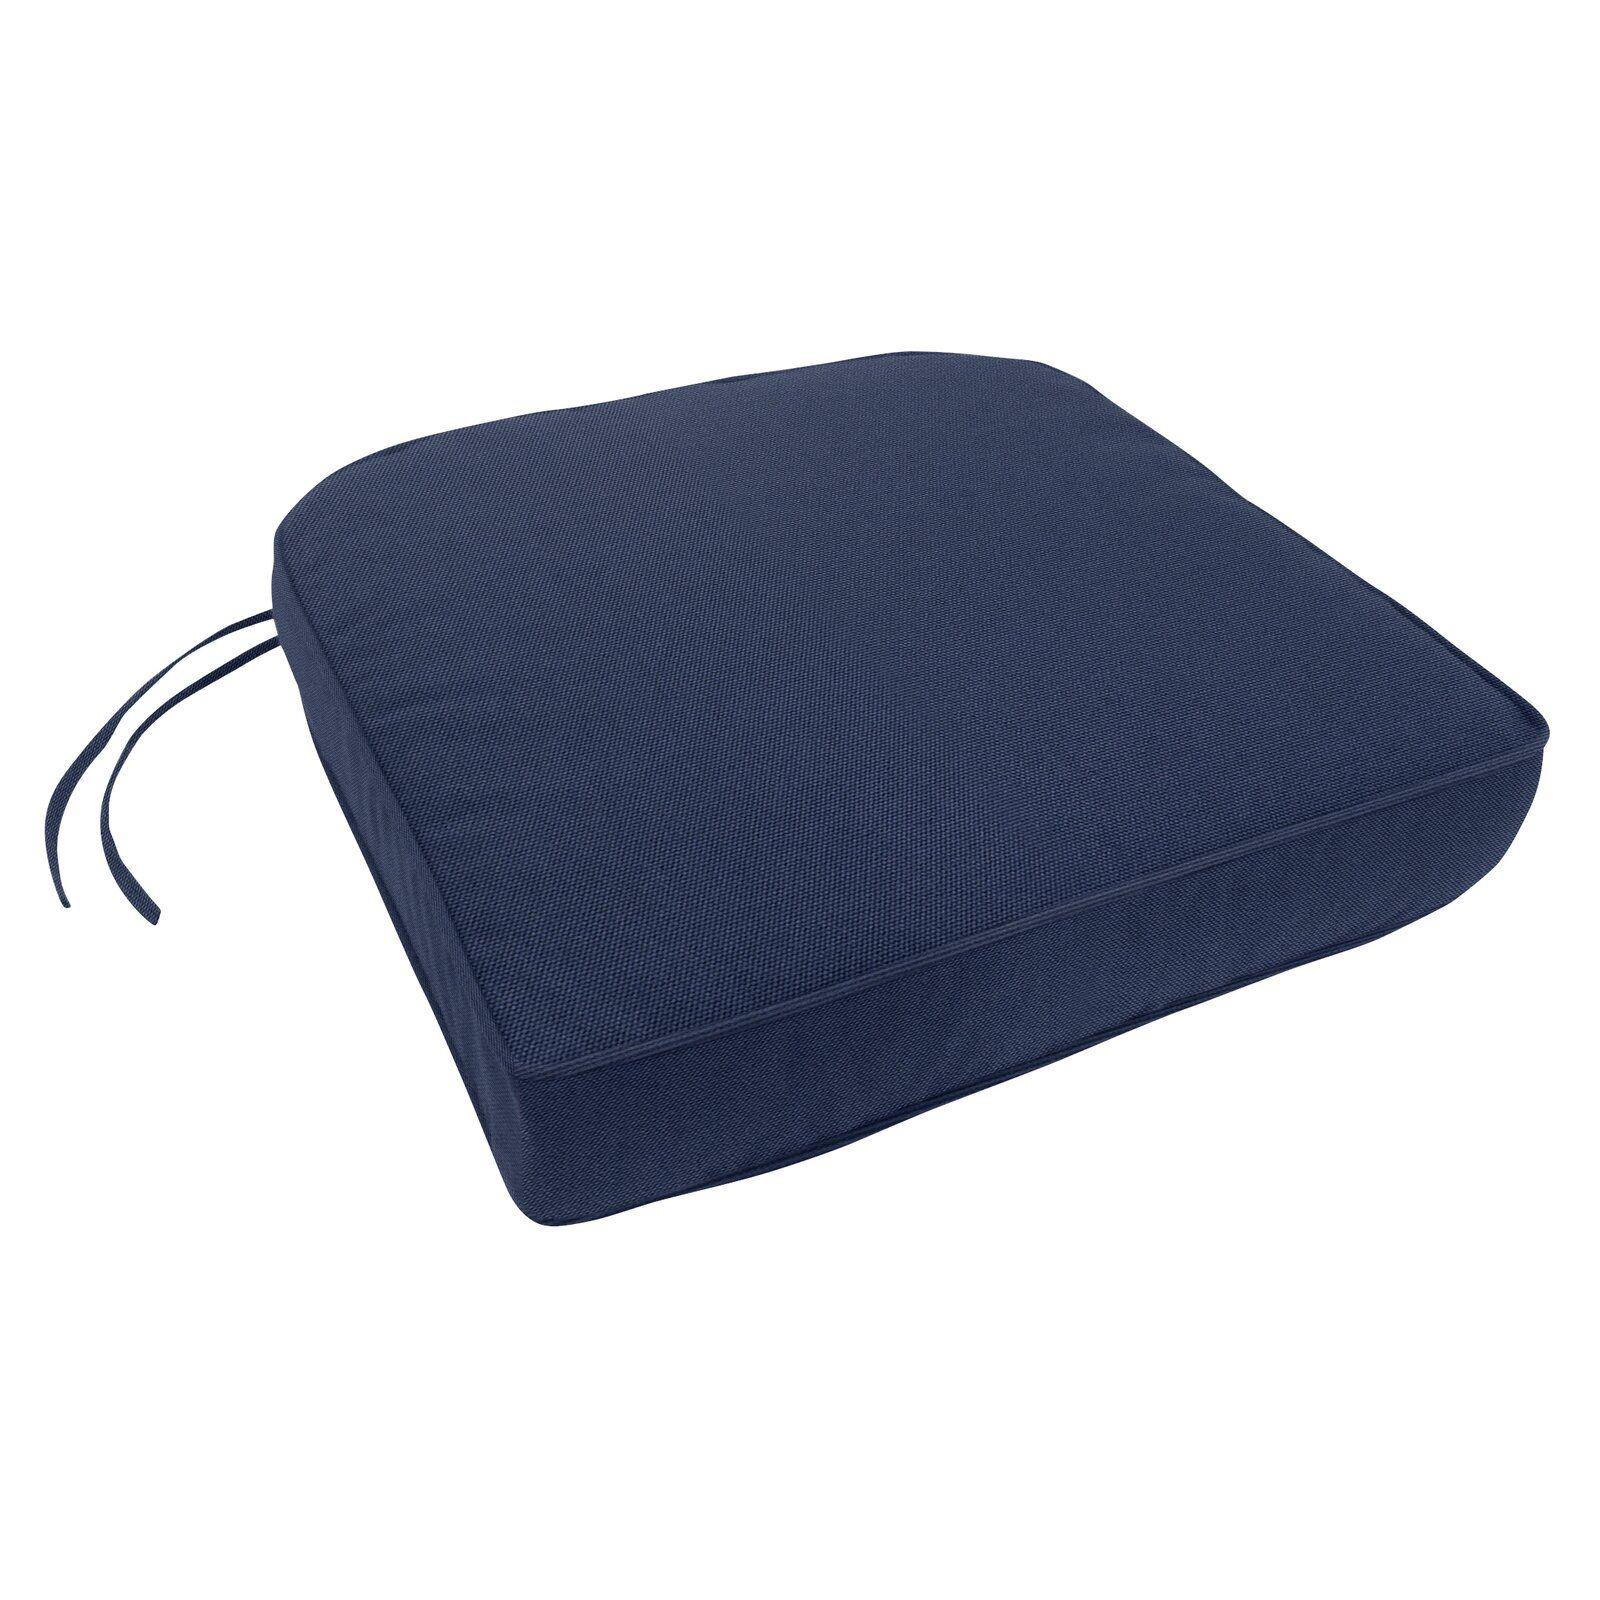 DoublePiped Indoor/Outdoor Sunbrella Contour Chair